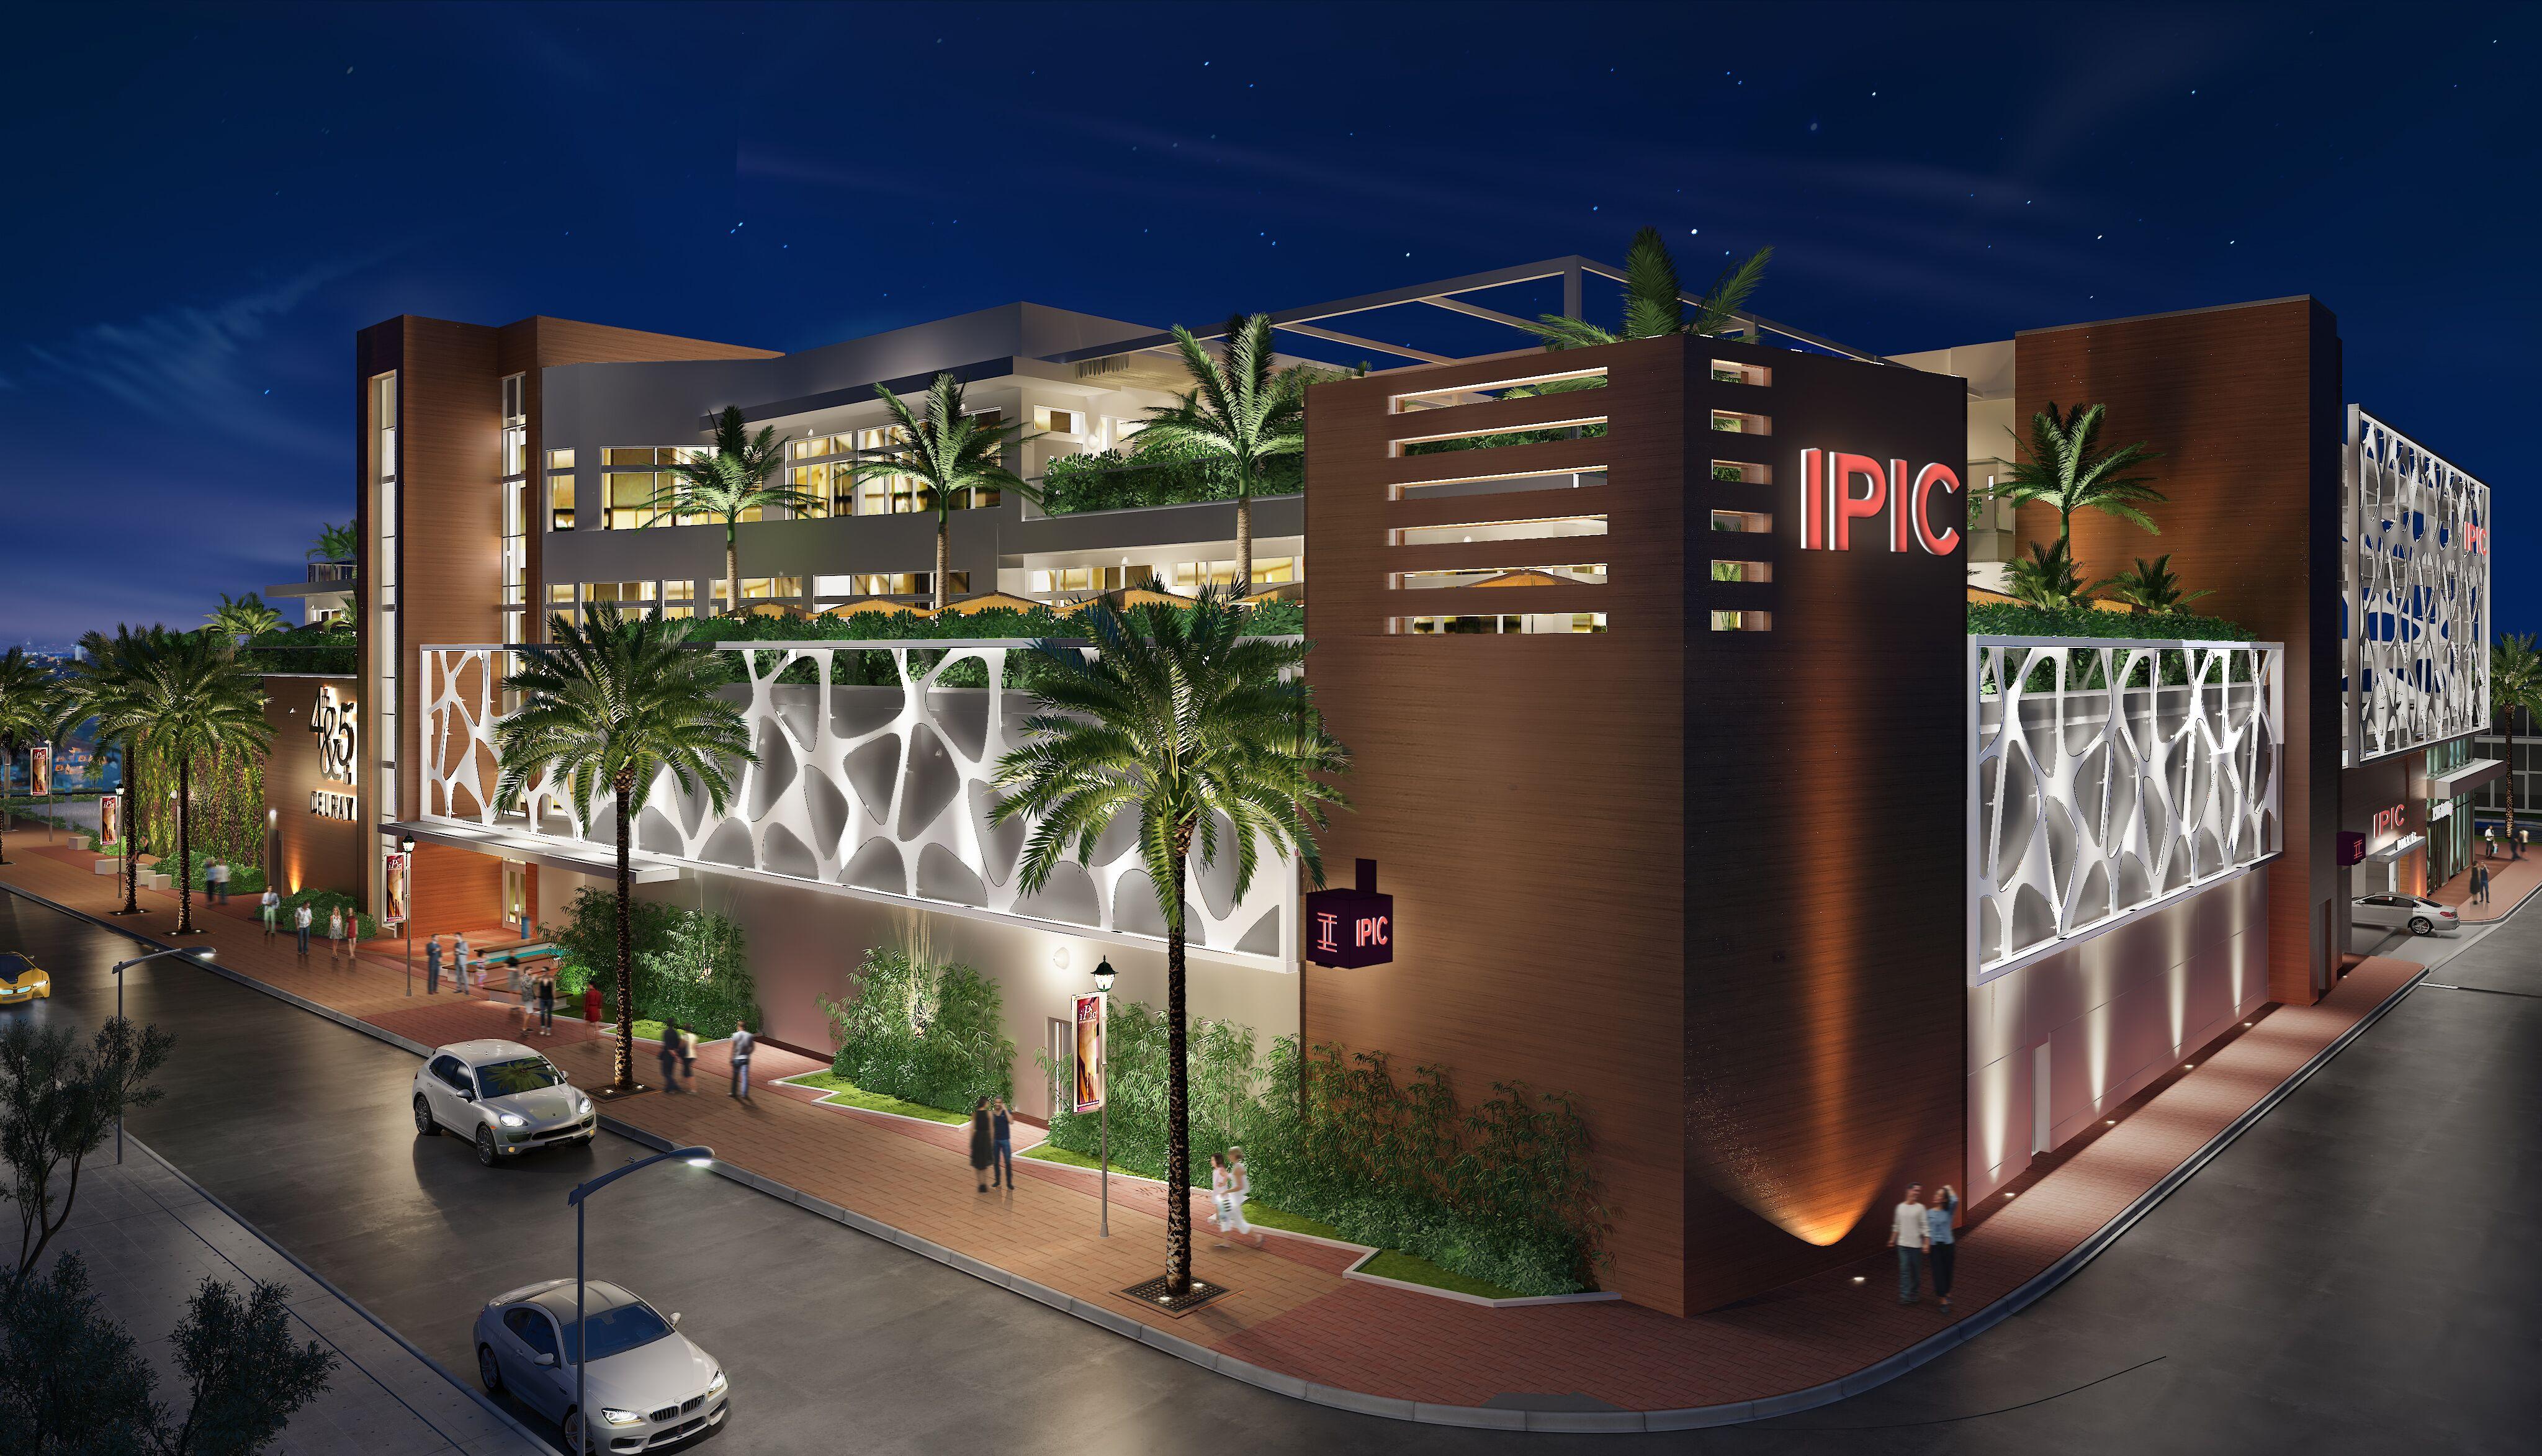 IPic Delray - Downtown Movie Theater Palm Beach Gardens